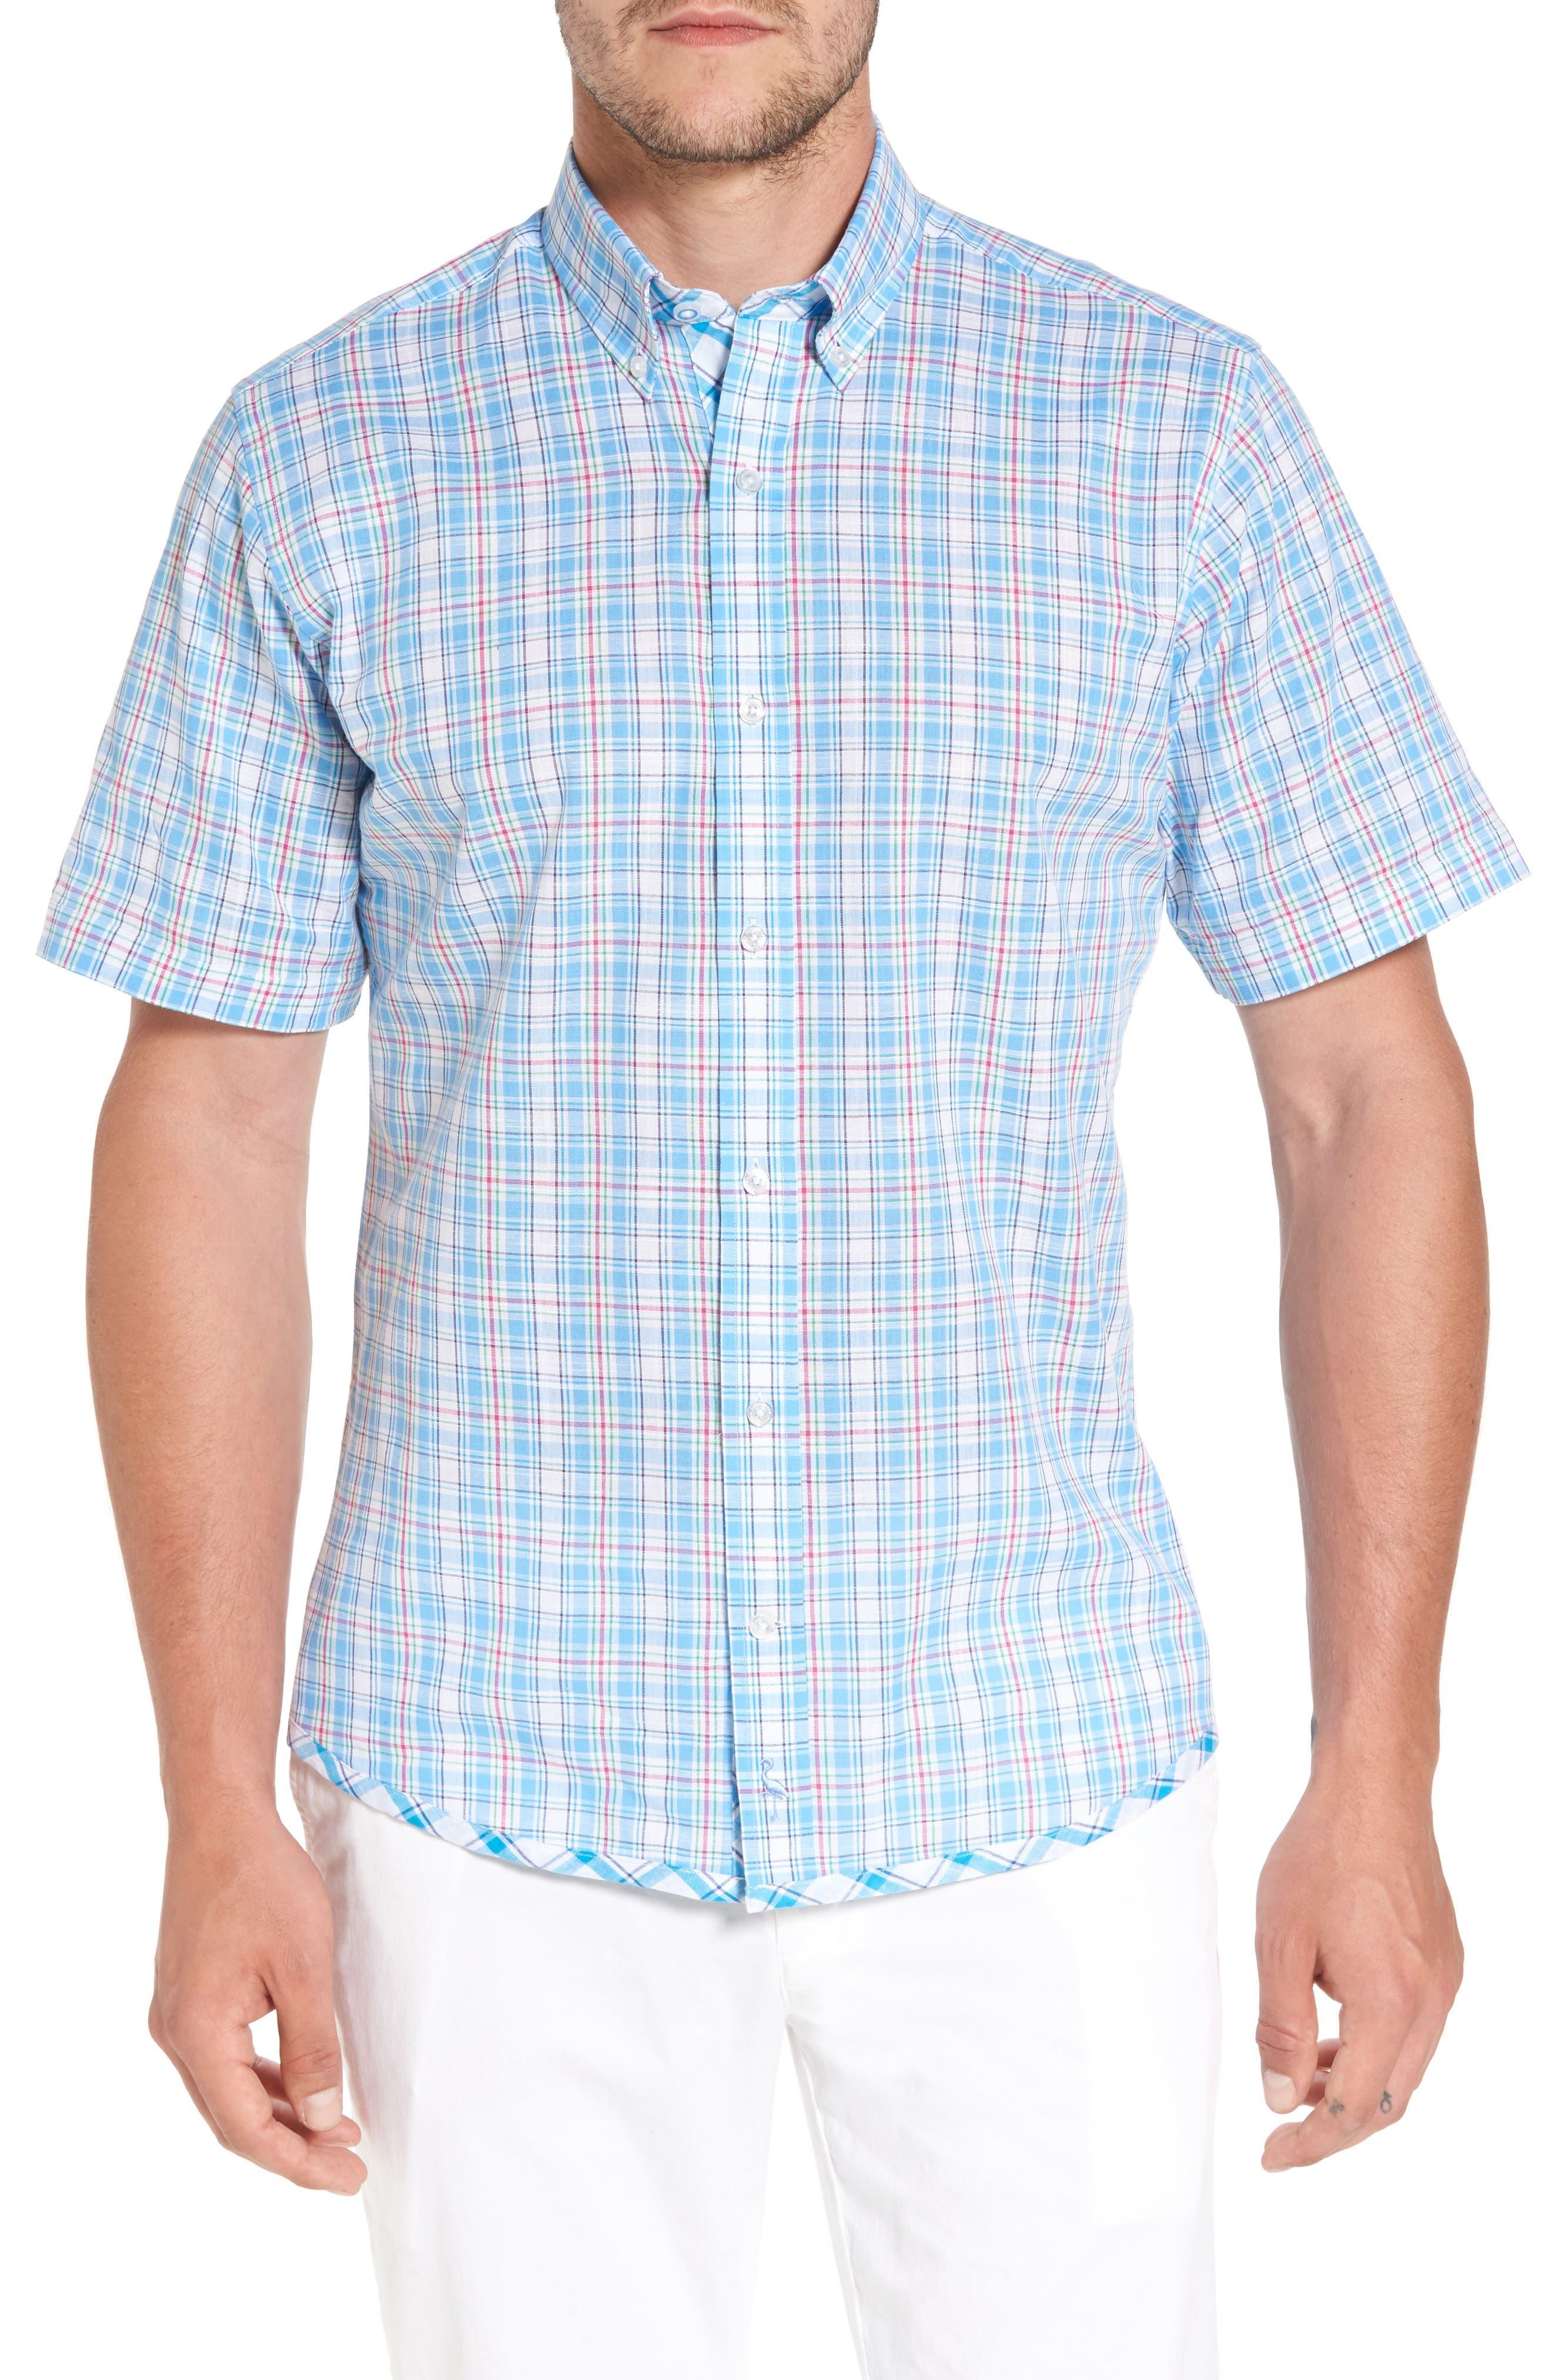 Main Image - TailorByrd Nectarine Sport Shirt